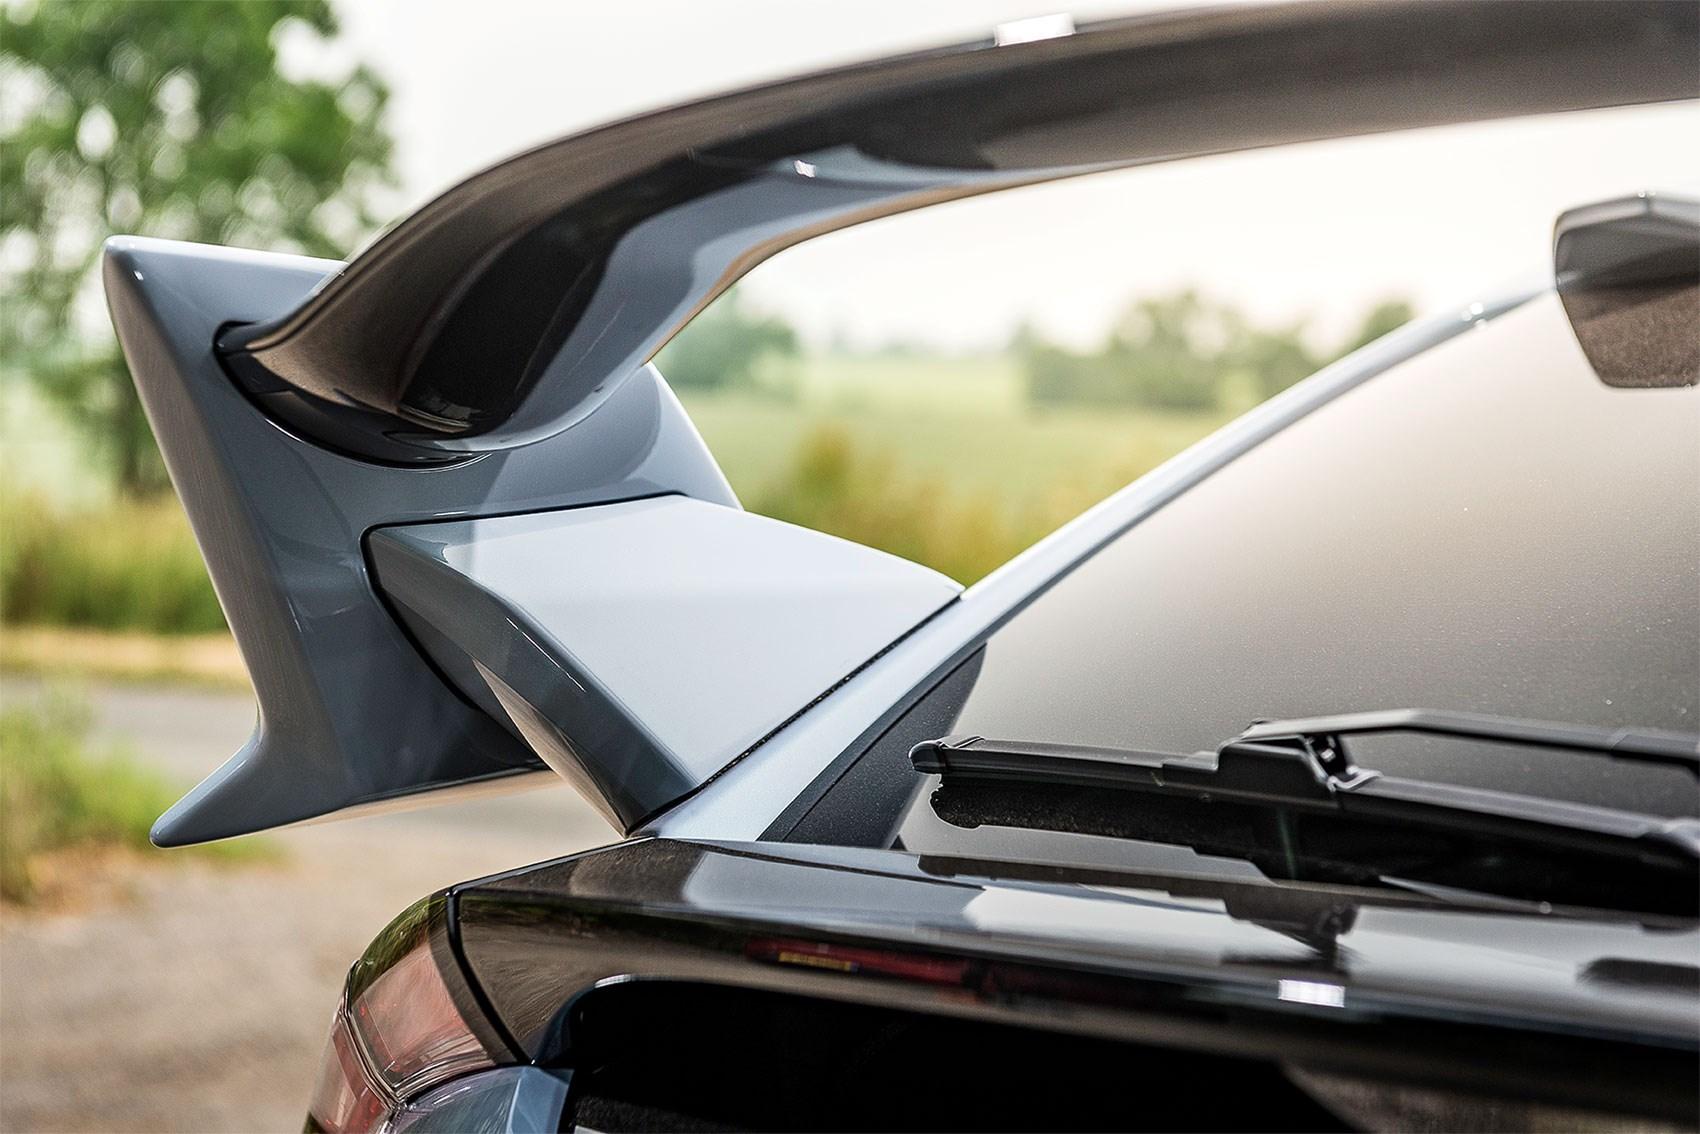 Honda Civic Type R Vs Ford Focus Rs Vs Bmw M140i Vs Seat